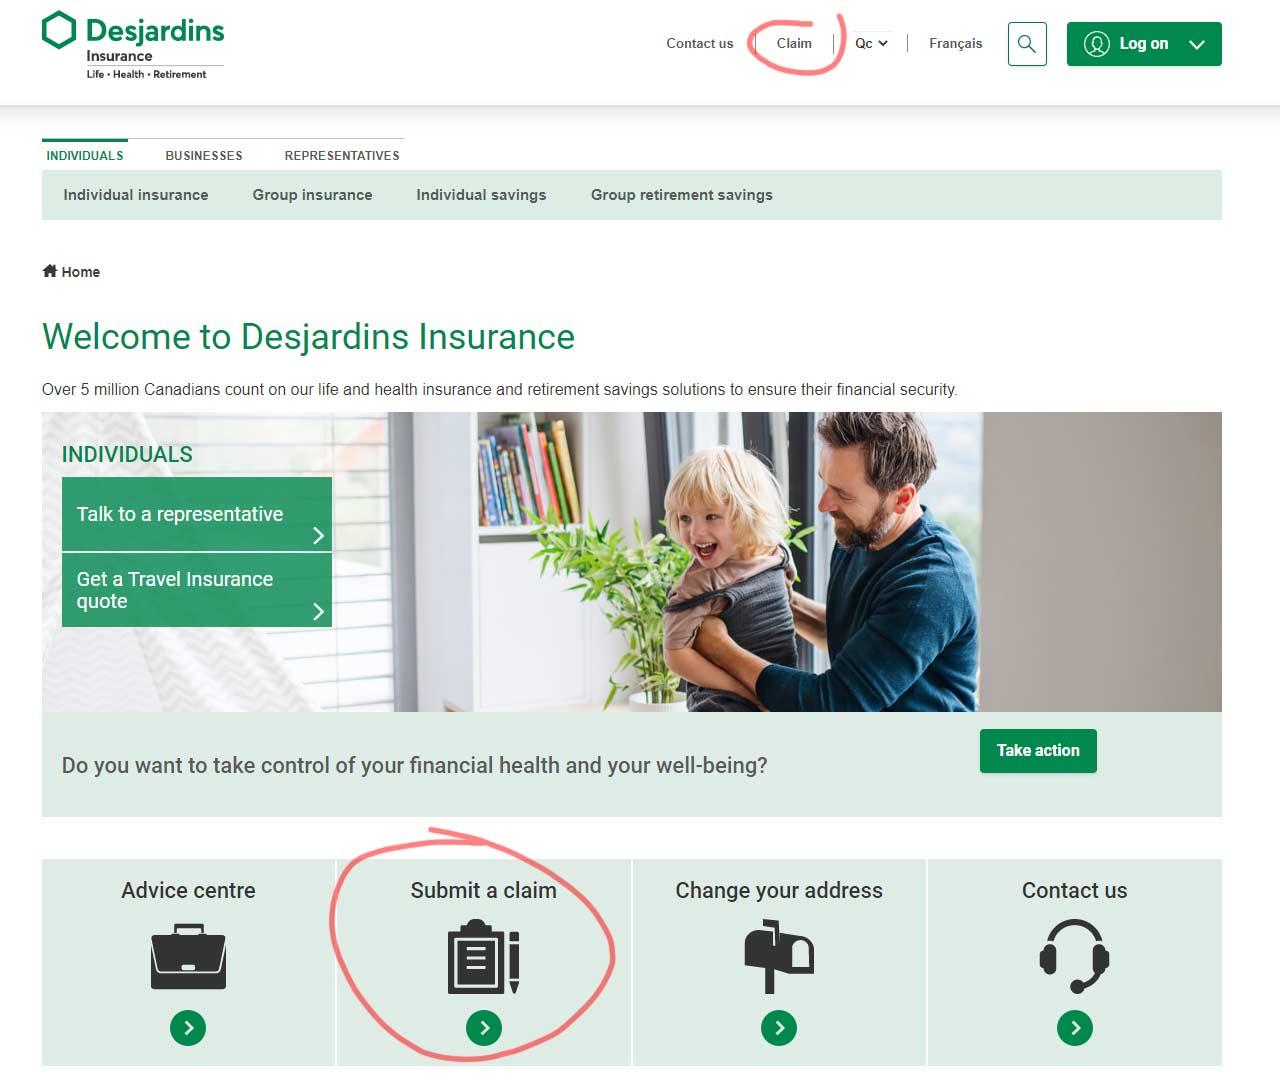 Desjardins Insuance Portal claim screenshot